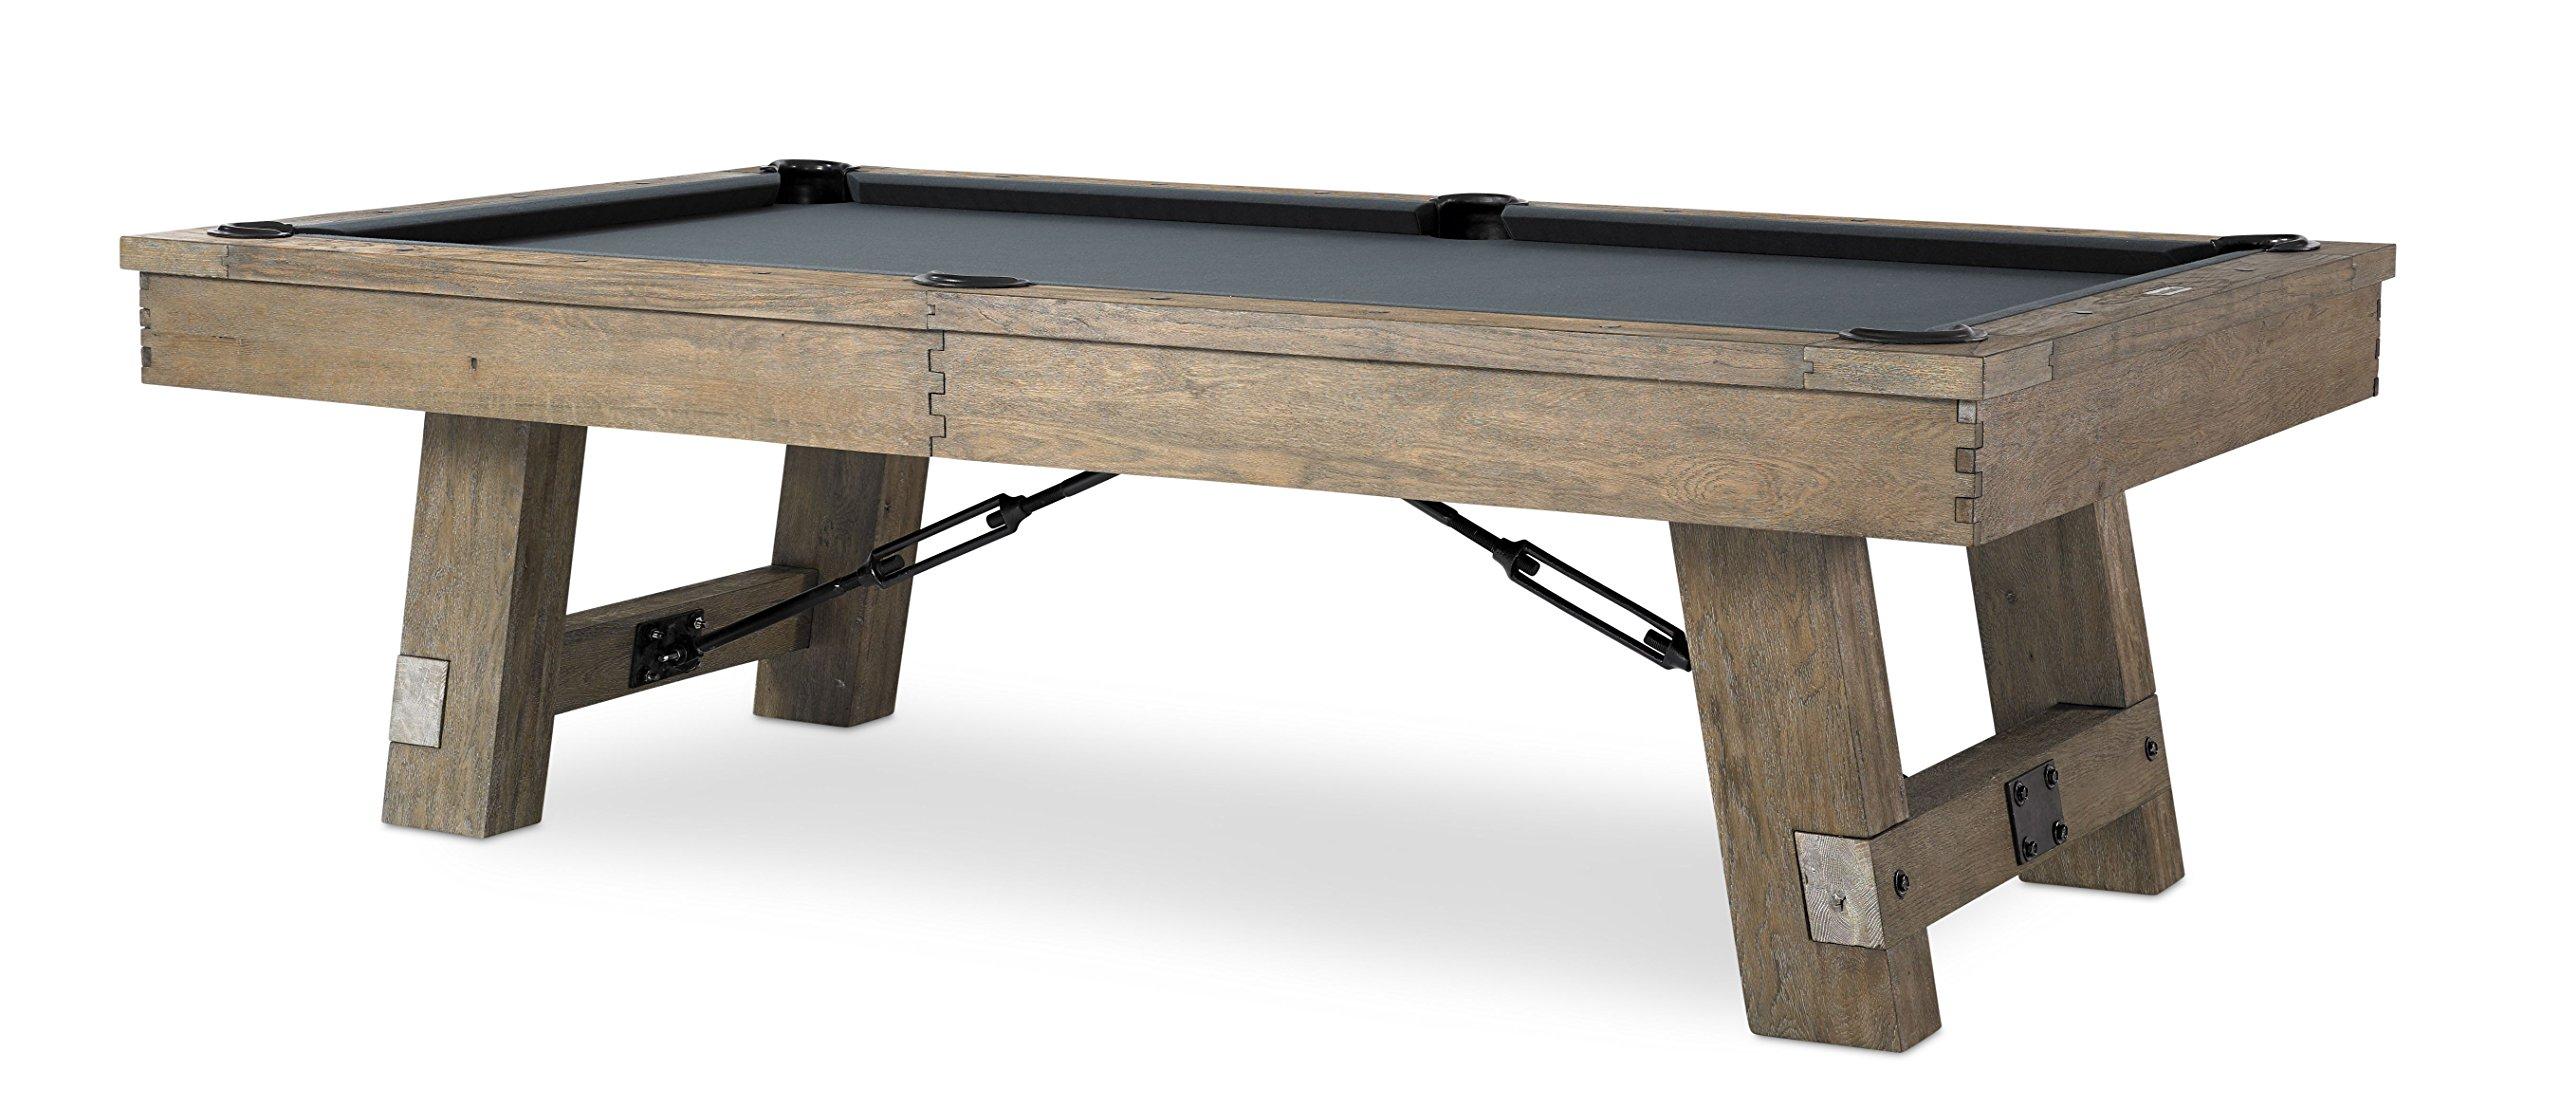 Plank & Hide Isaac 8 ft Billiards Pool Table - Silvered Oak